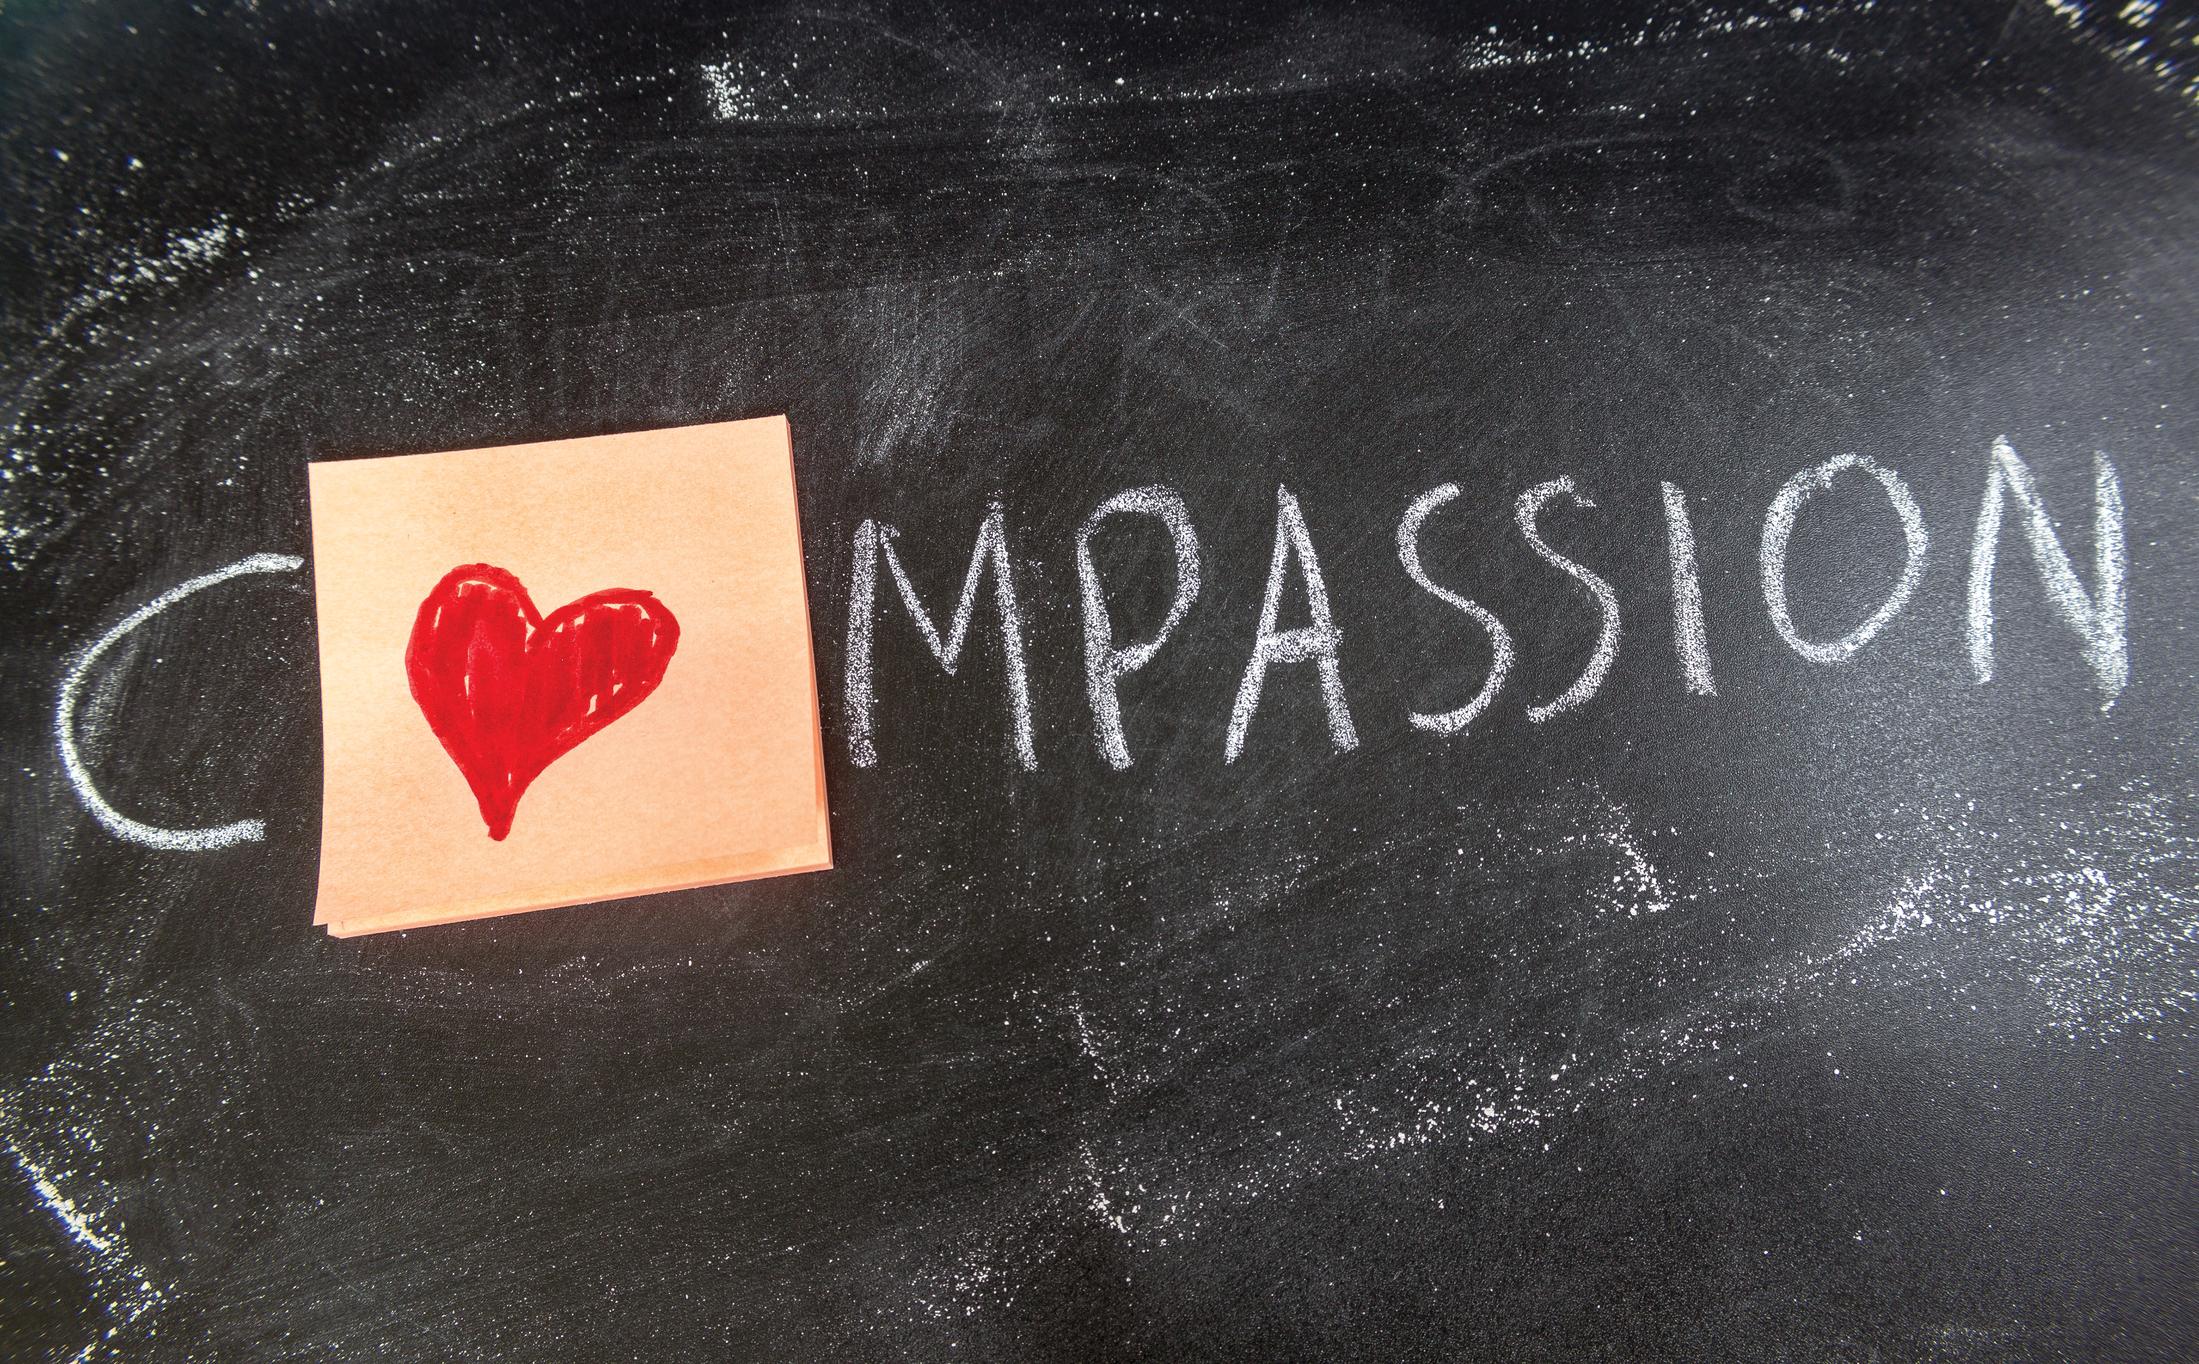 Compassion essays